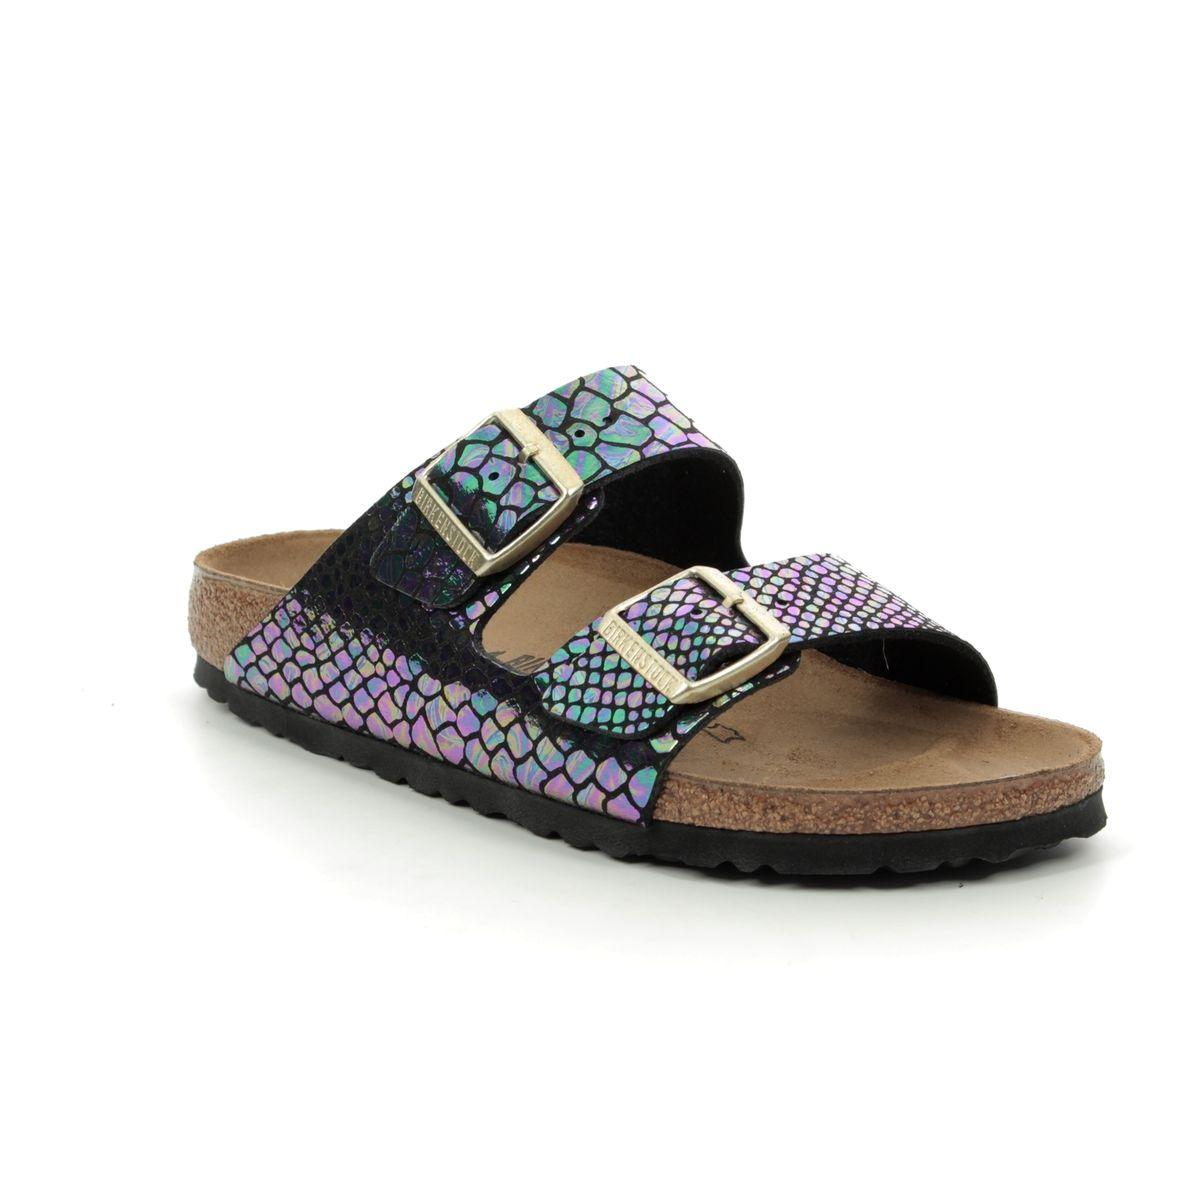 2f32507927cc Birkenstock Slide Sandals - Black - 1003463 ARIZONA SHINY SNAKE NARROW FIT